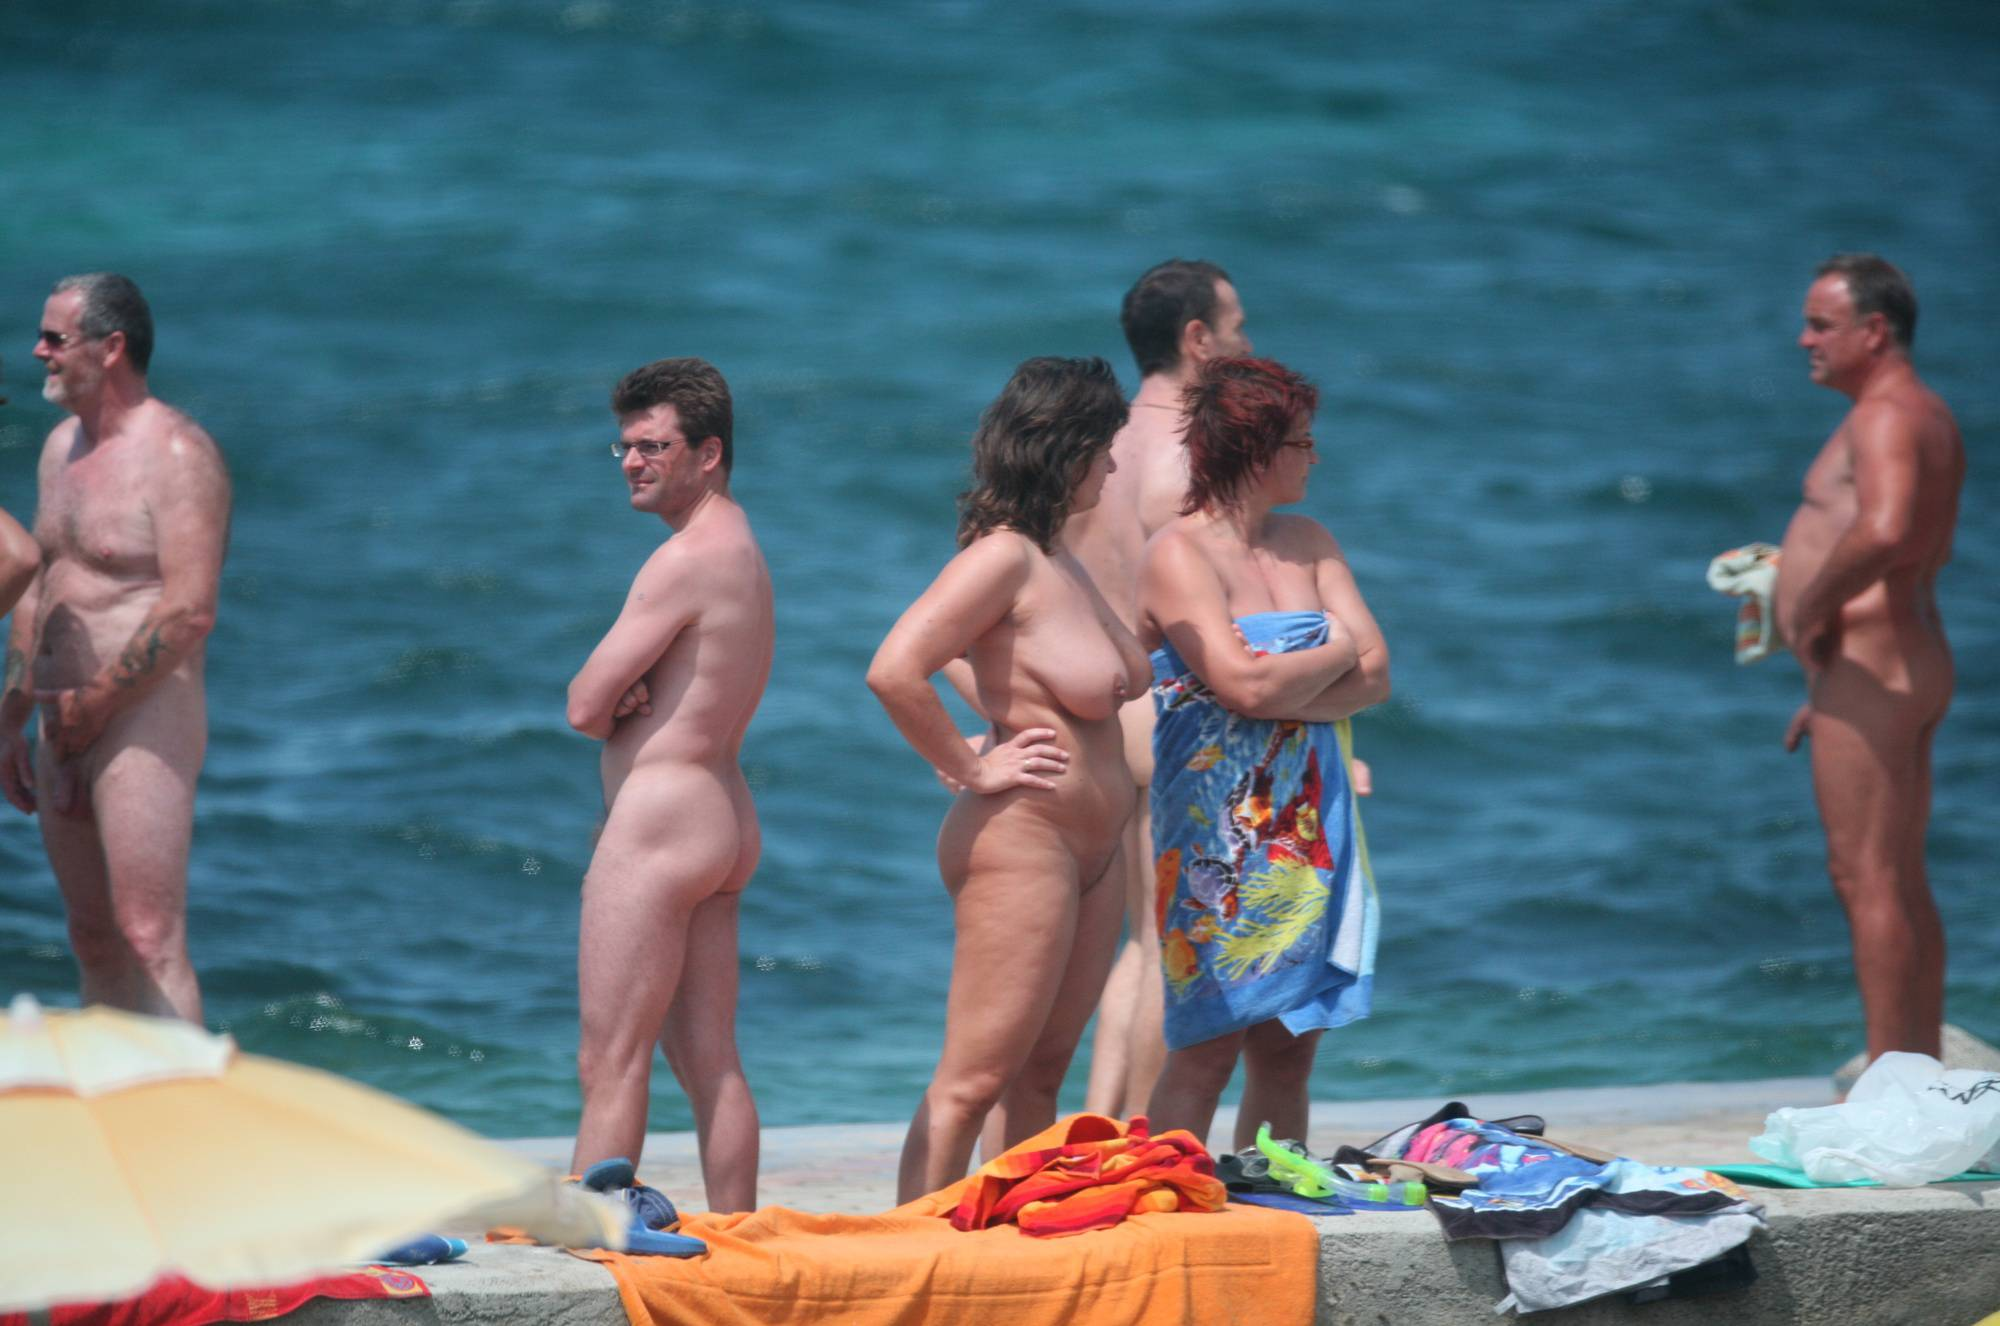 Pure Nudism Photos-Pier Sand Square Bathers - 1